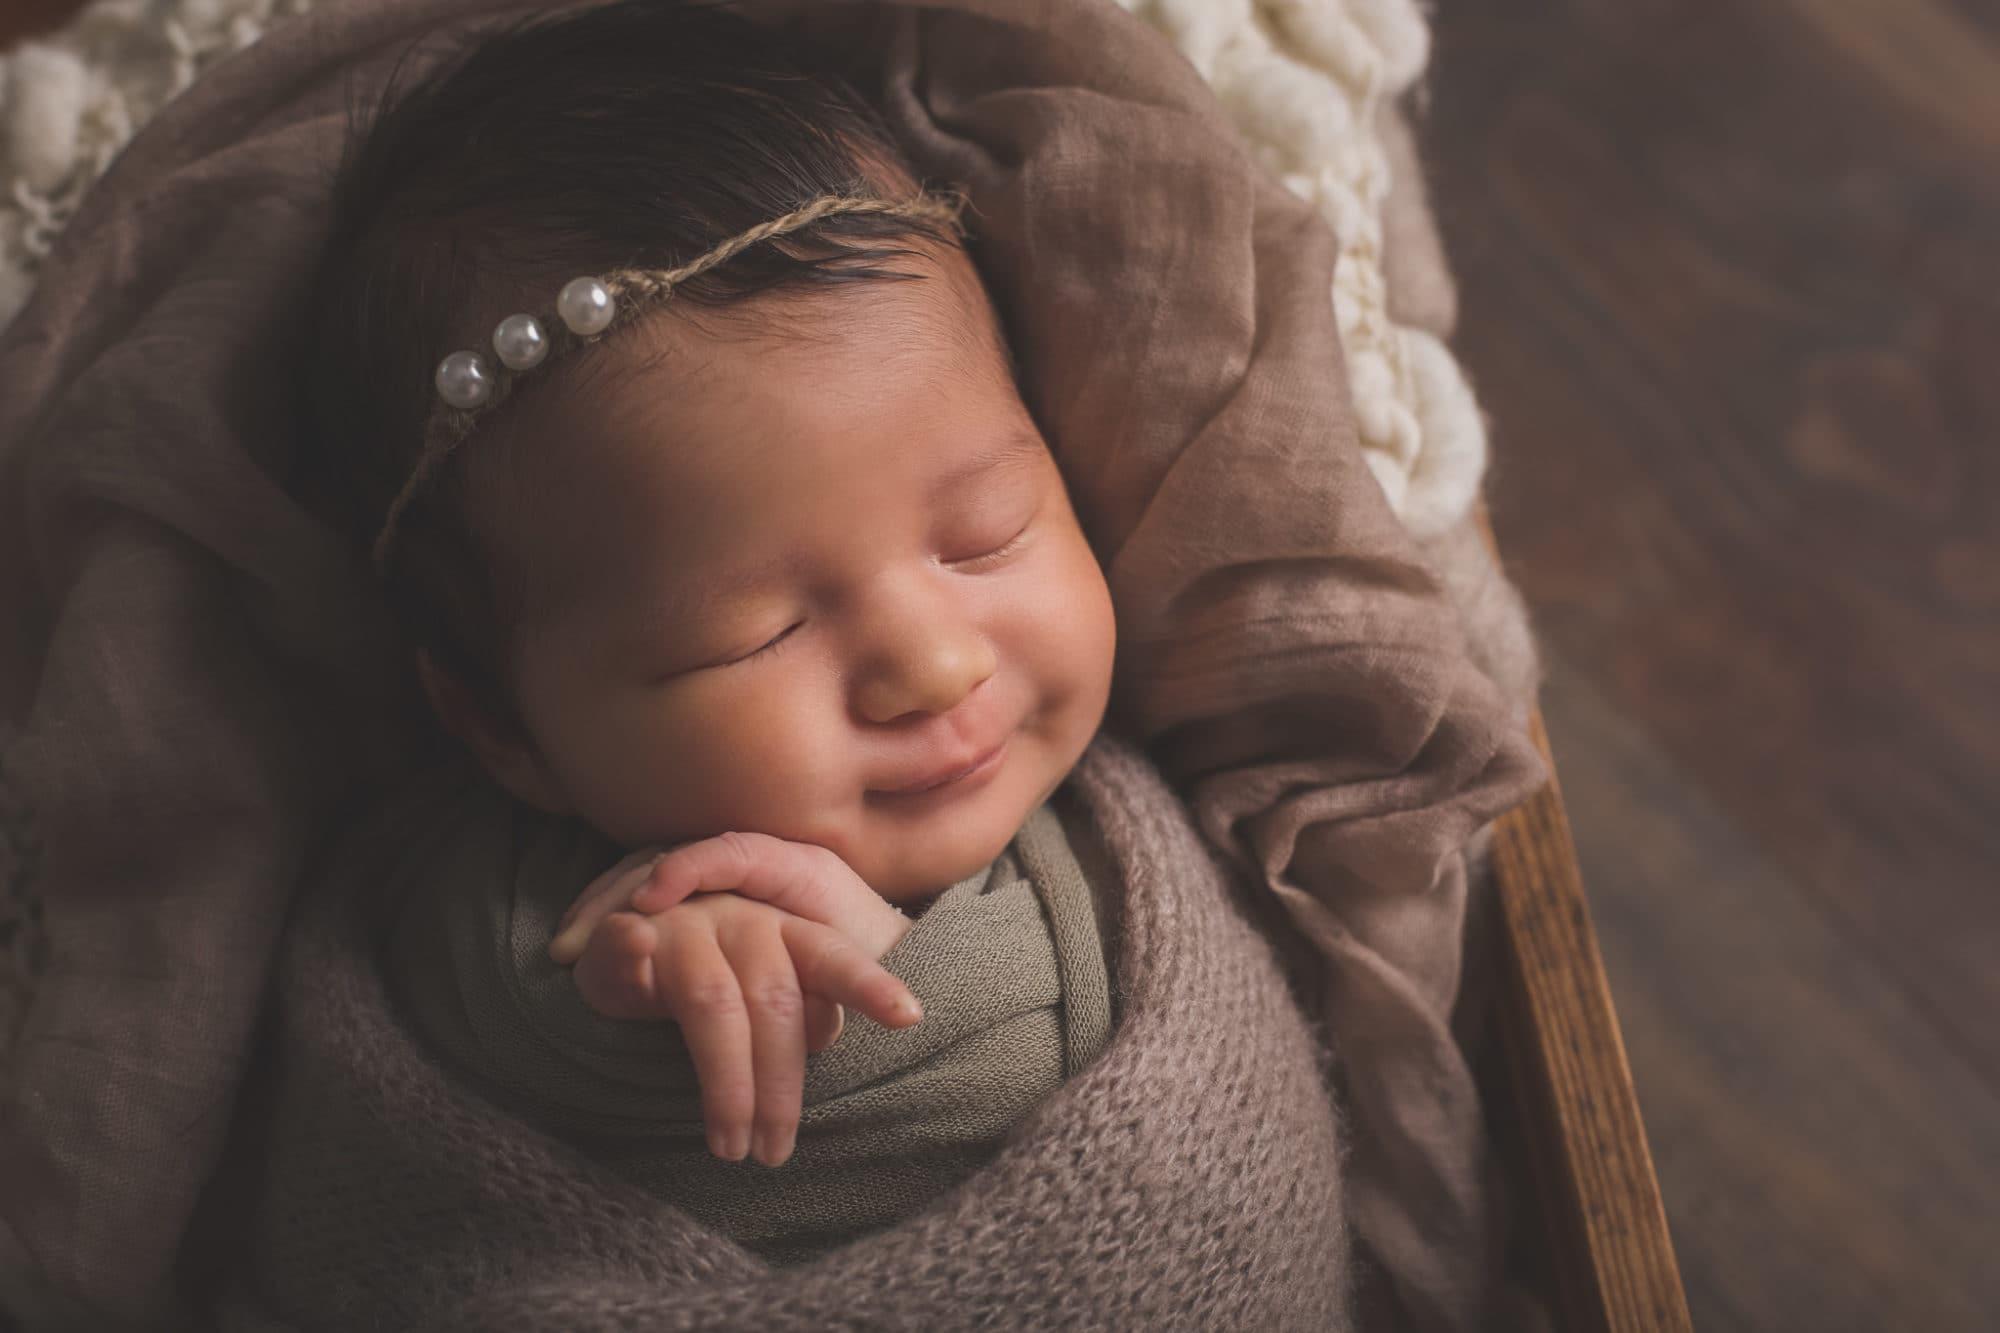 photos de bébé emmallioté